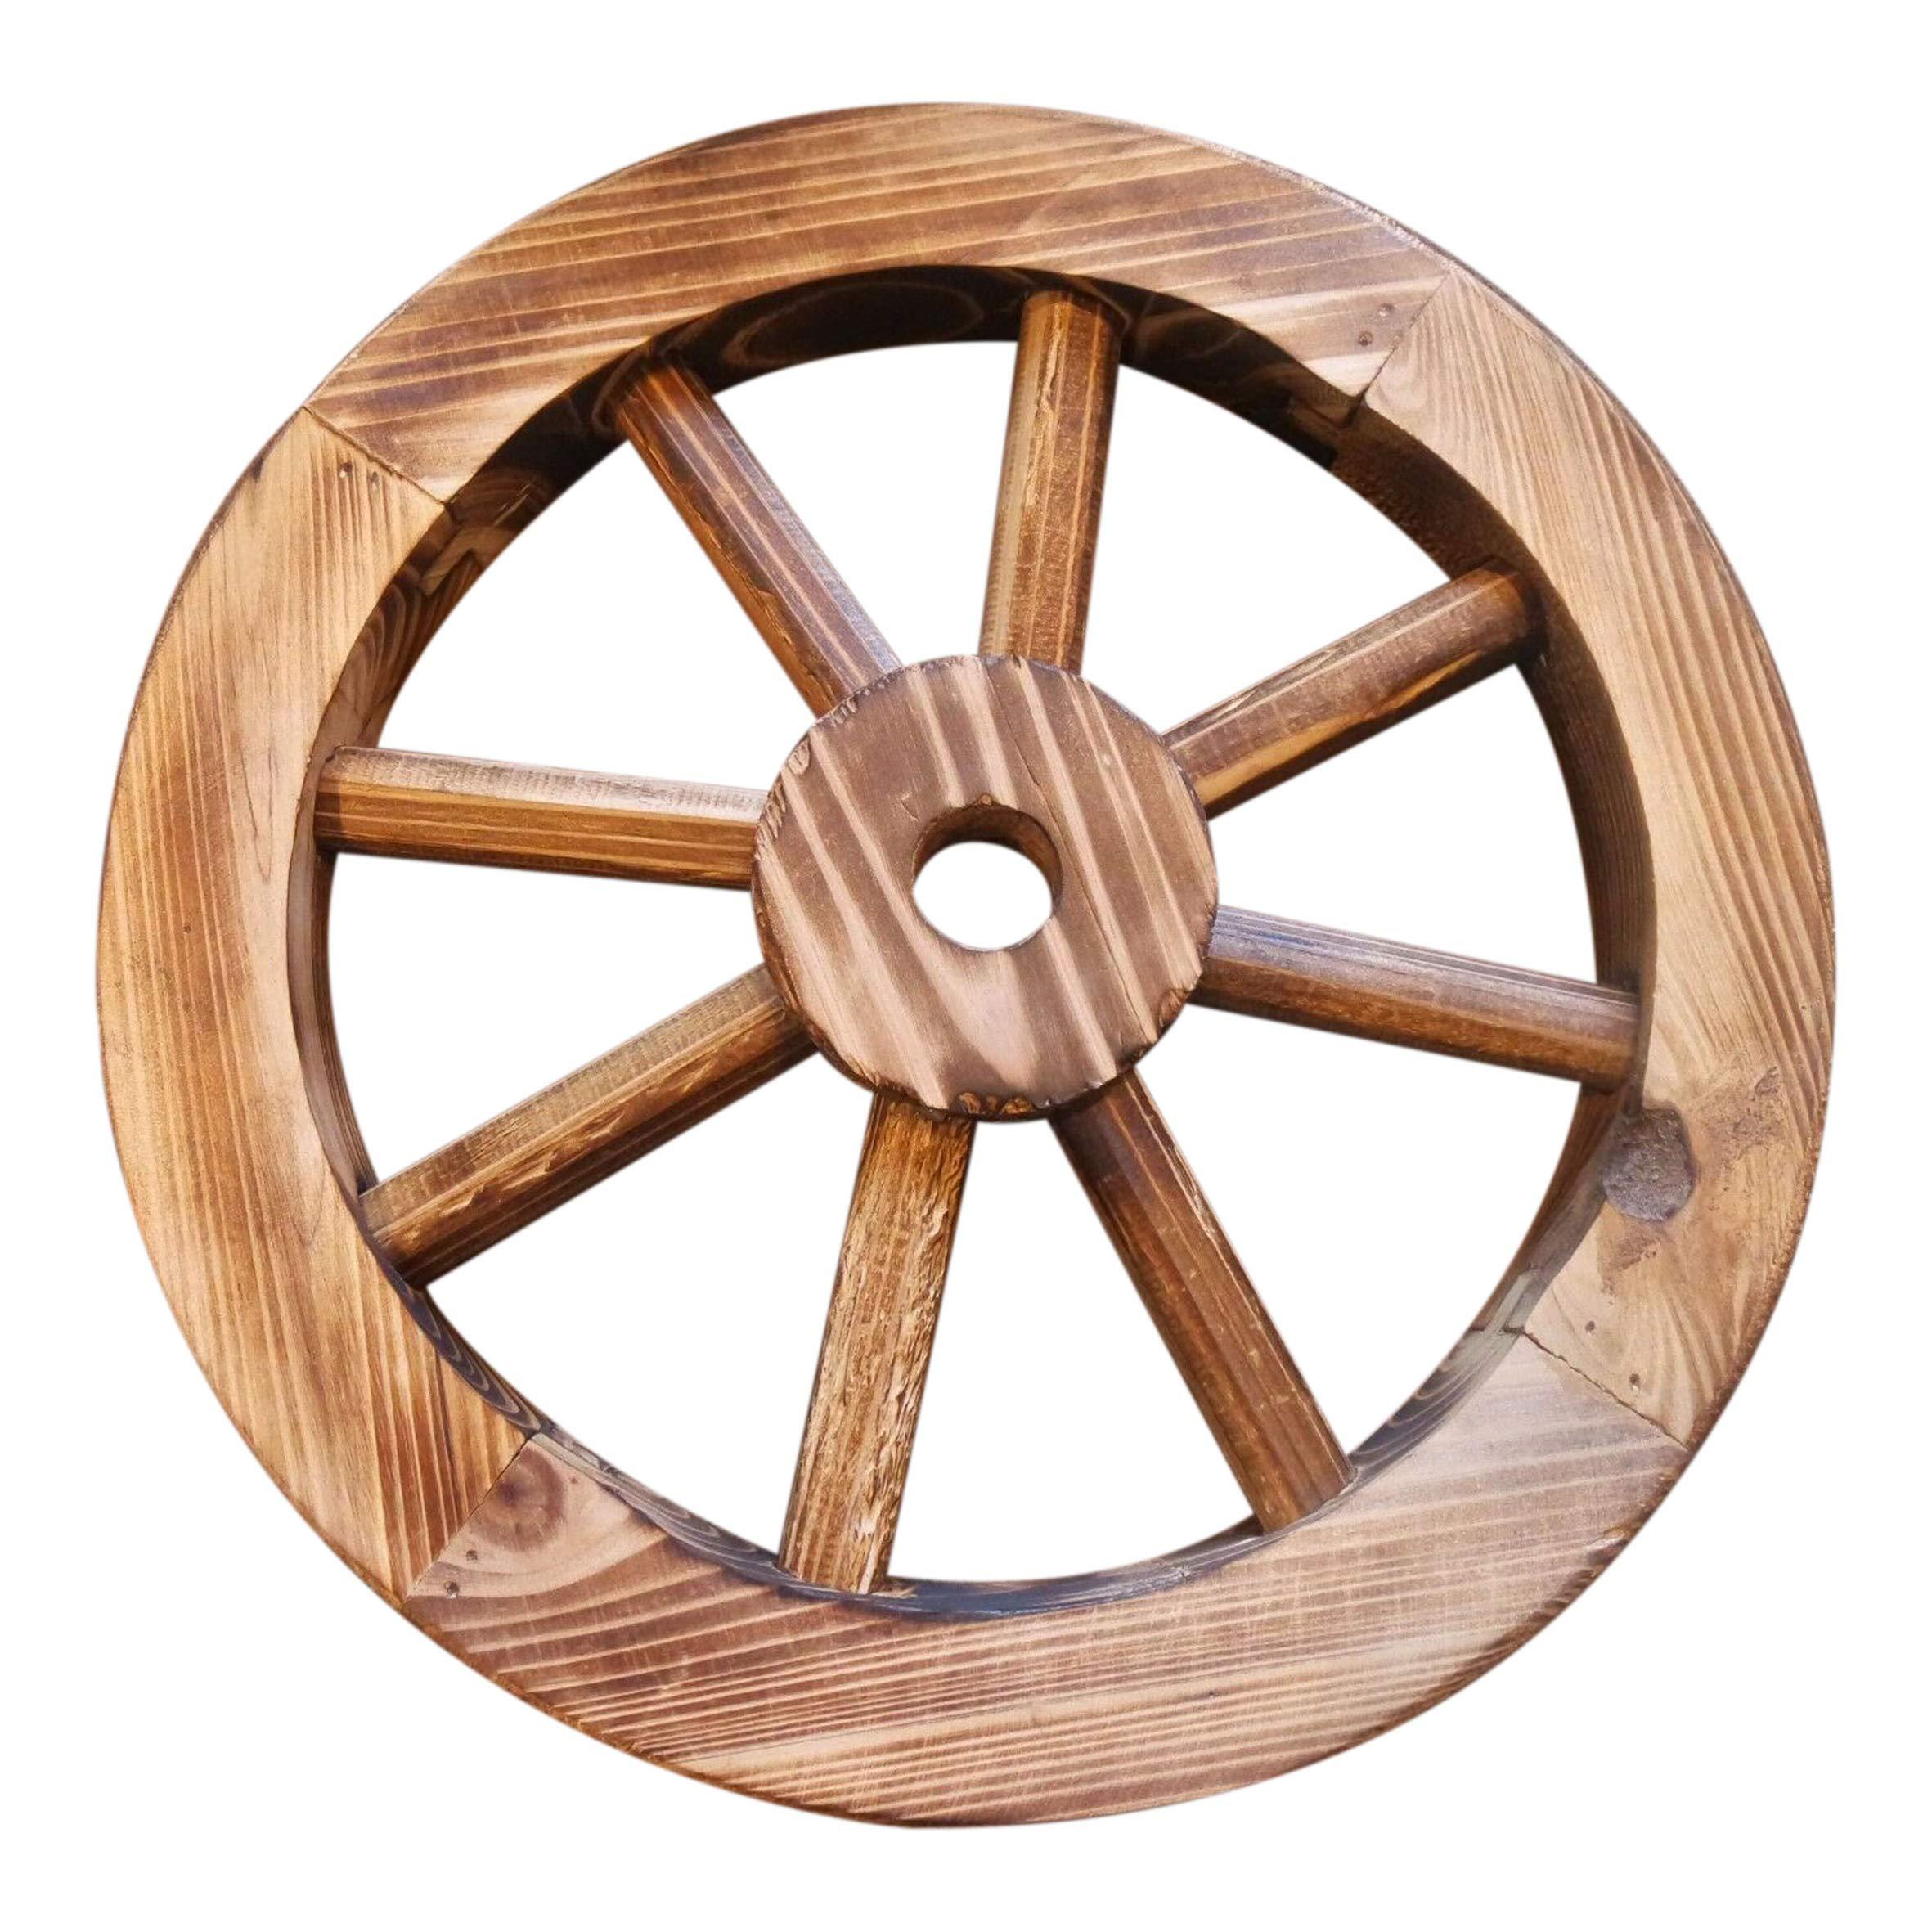 Galapagoz Wooden Wagon Wheels Burnt Wood Wheel Look Garden Decor Table Centerpiece Decorative 12'' 2 Pack US by Galapagoz (Image #8)